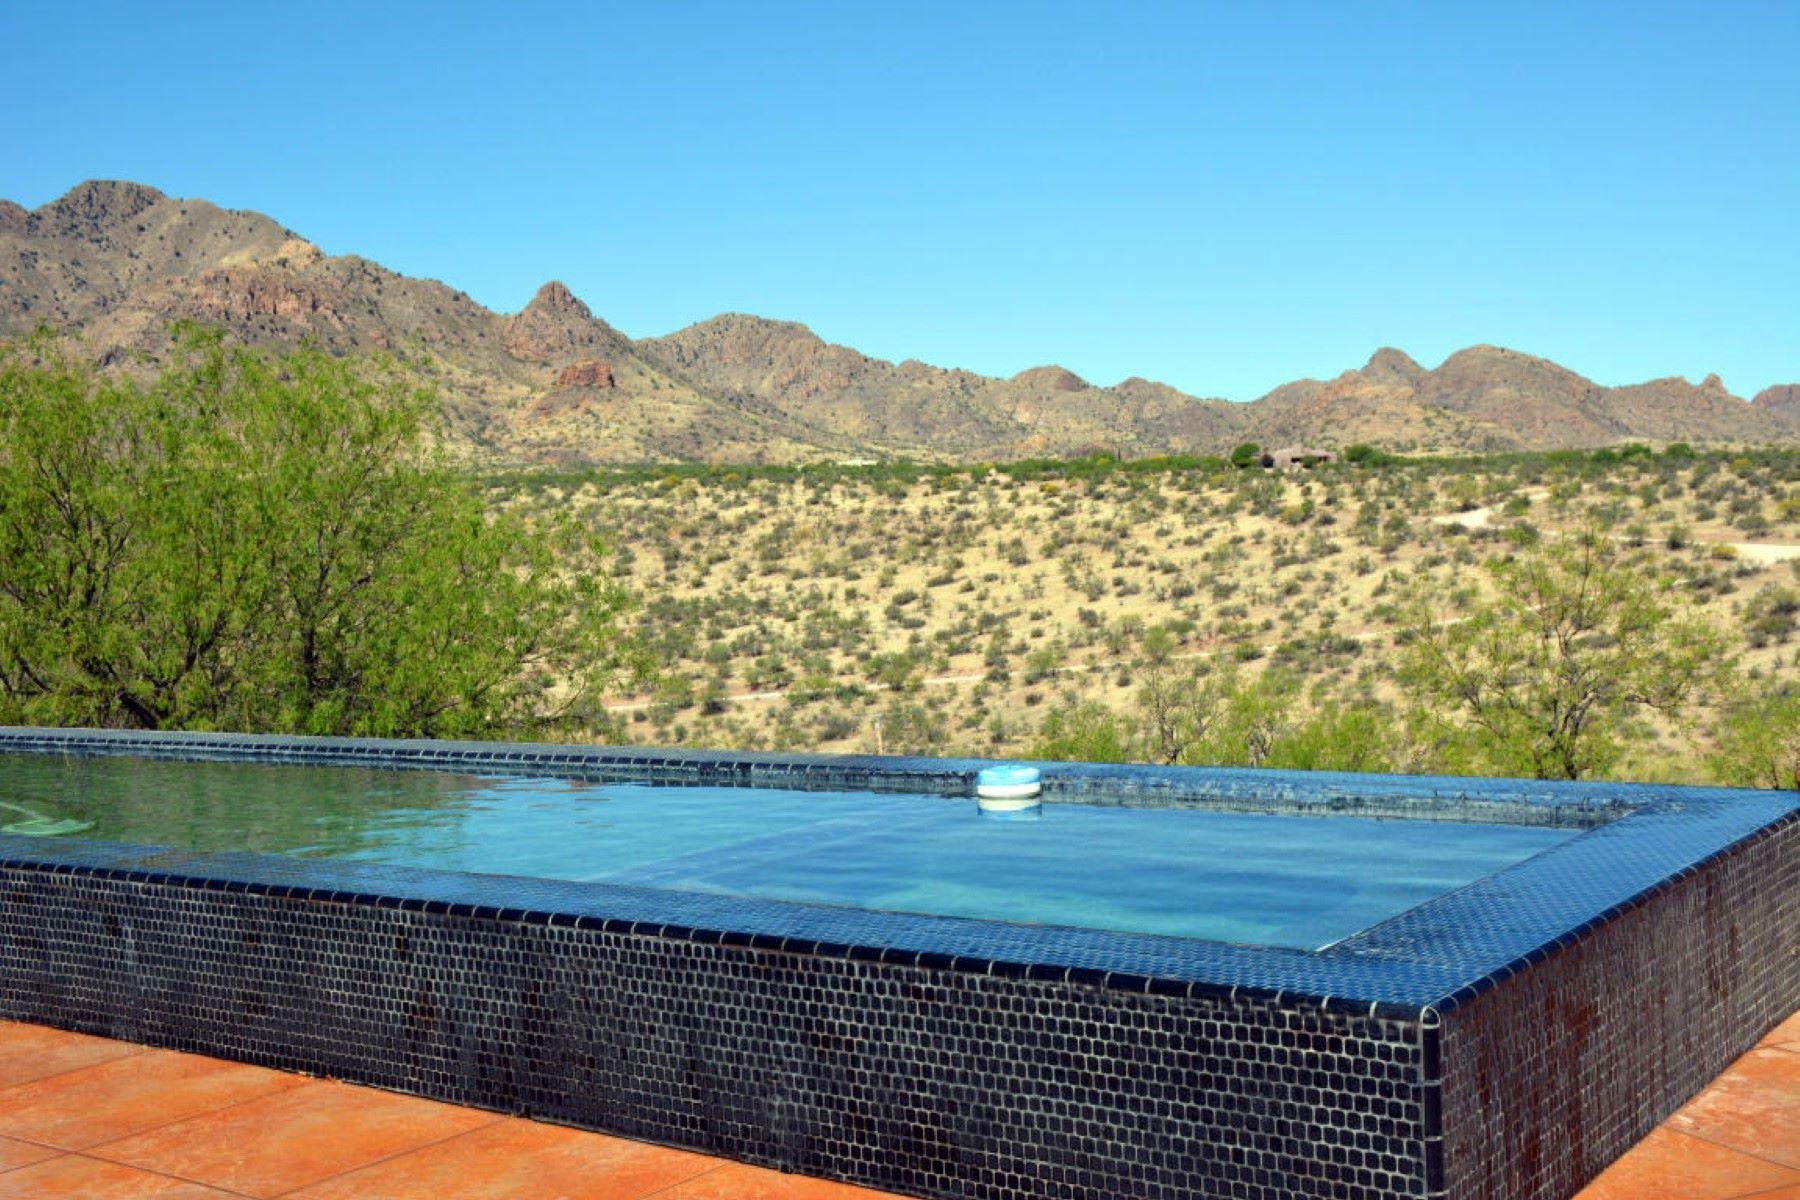 Single Family Home for Sale at Custom California contempory home 33 Guadalupe Lane Tubac, Arizona, 85646 United States